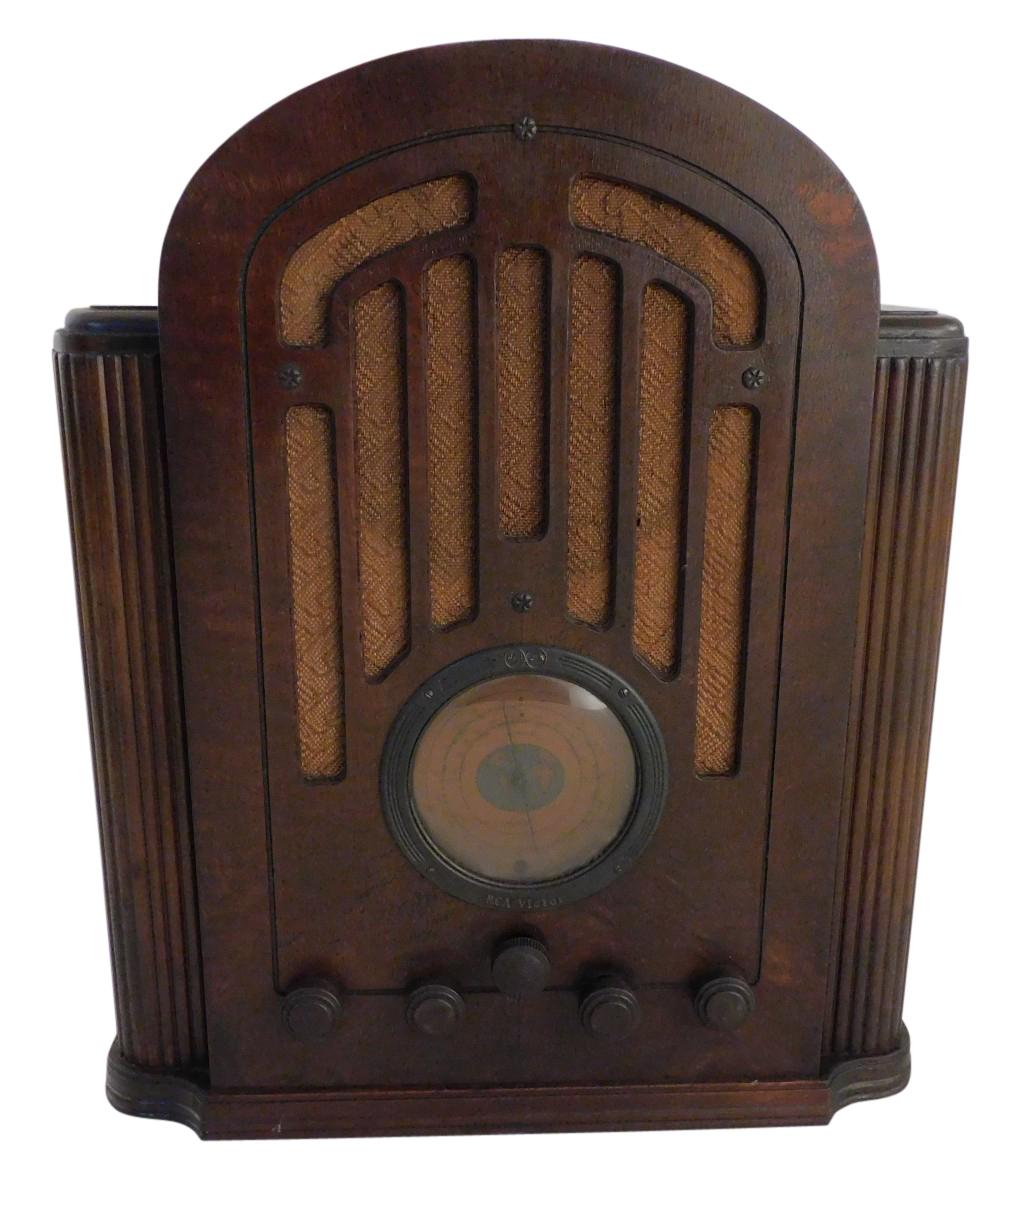 1930's RCA Victor Premium Cathedral Radio